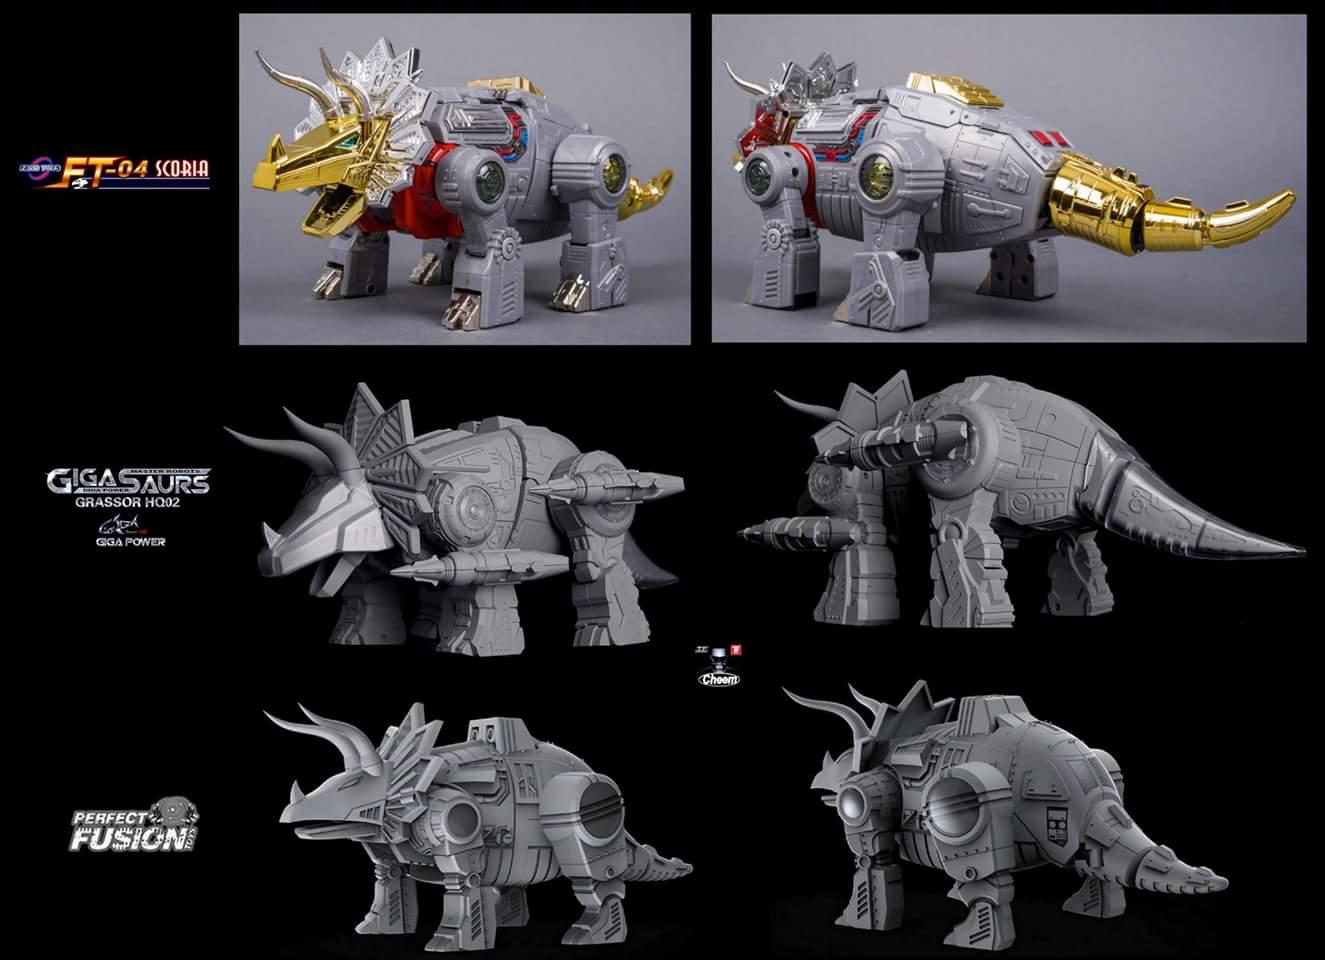 [PerfectFusion] Produit Tiers - Jouet PF-01 Cesium aka Slag/Scories (Dinobots) WOhBjf0m